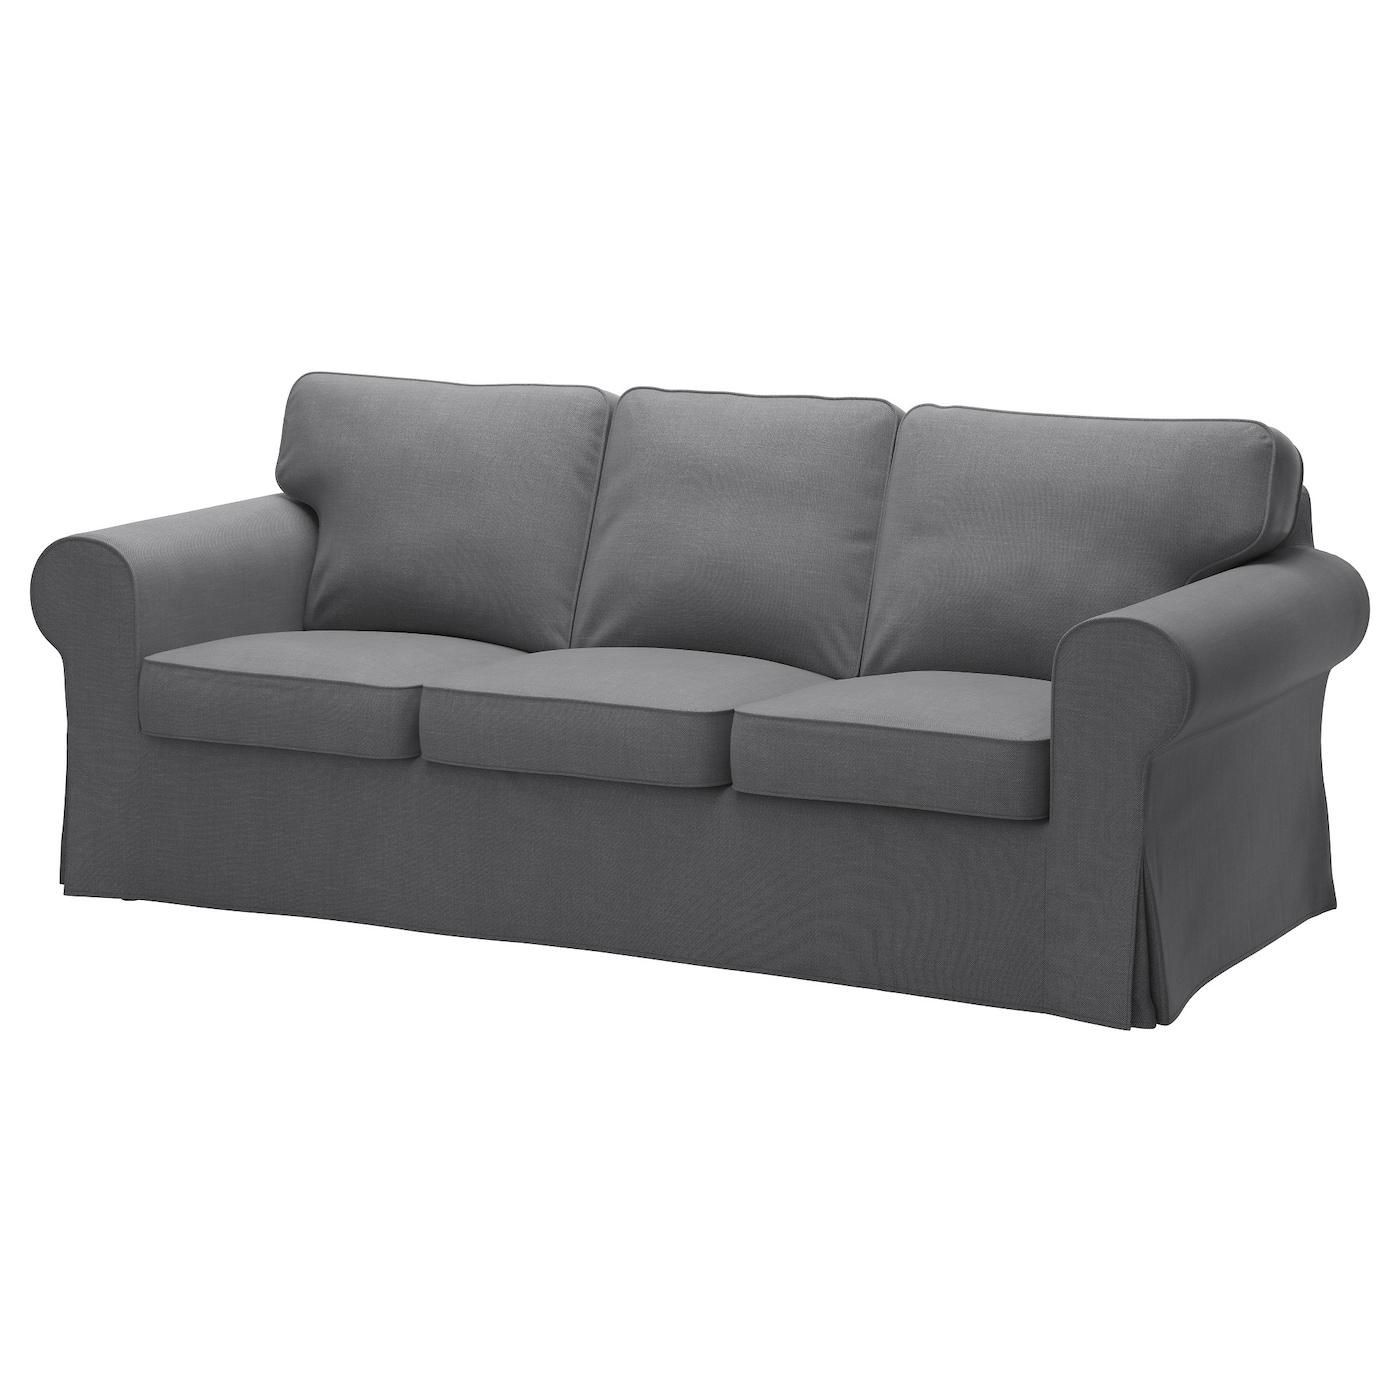 Canapés En Tissu IKEA - Canapé ikea tissu